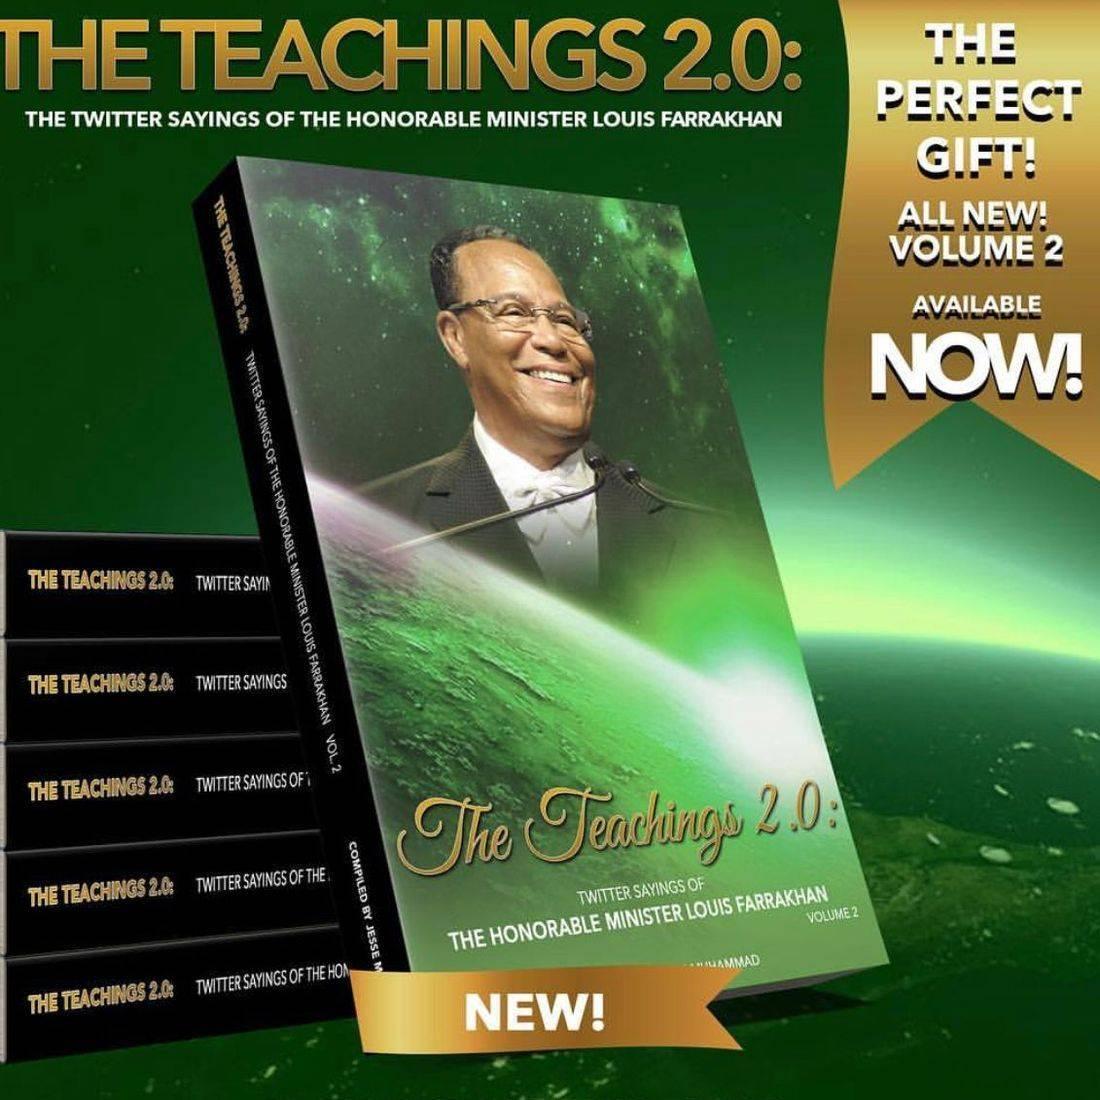 The Teachings 2.0: Twitter Book Vol 2